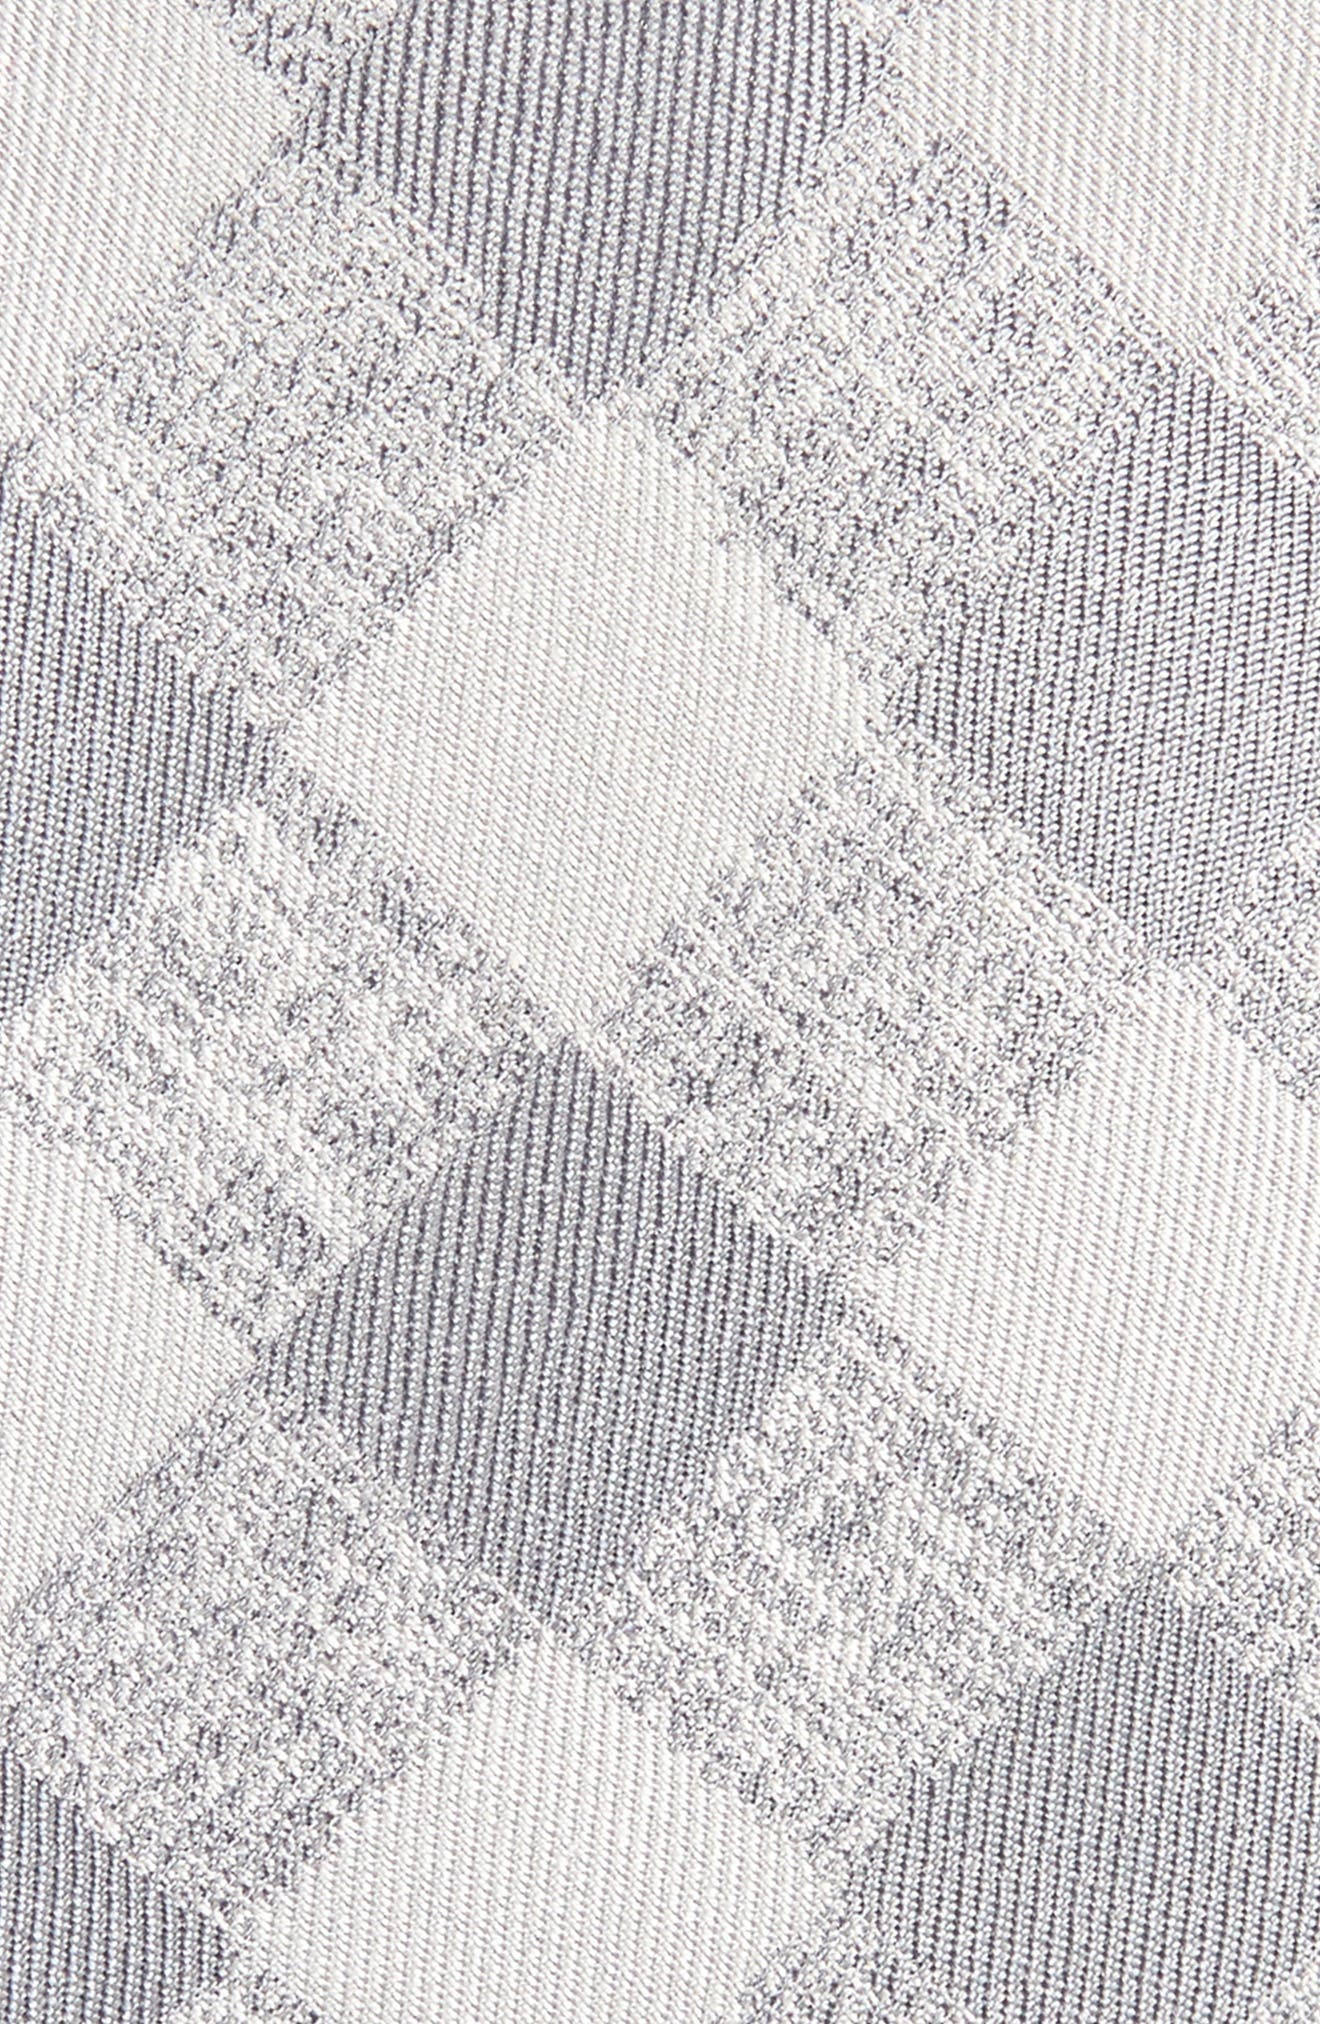 Tigrane Check Silk & Cotton Tie,                             Alternate thumbnail 2, color,                             020